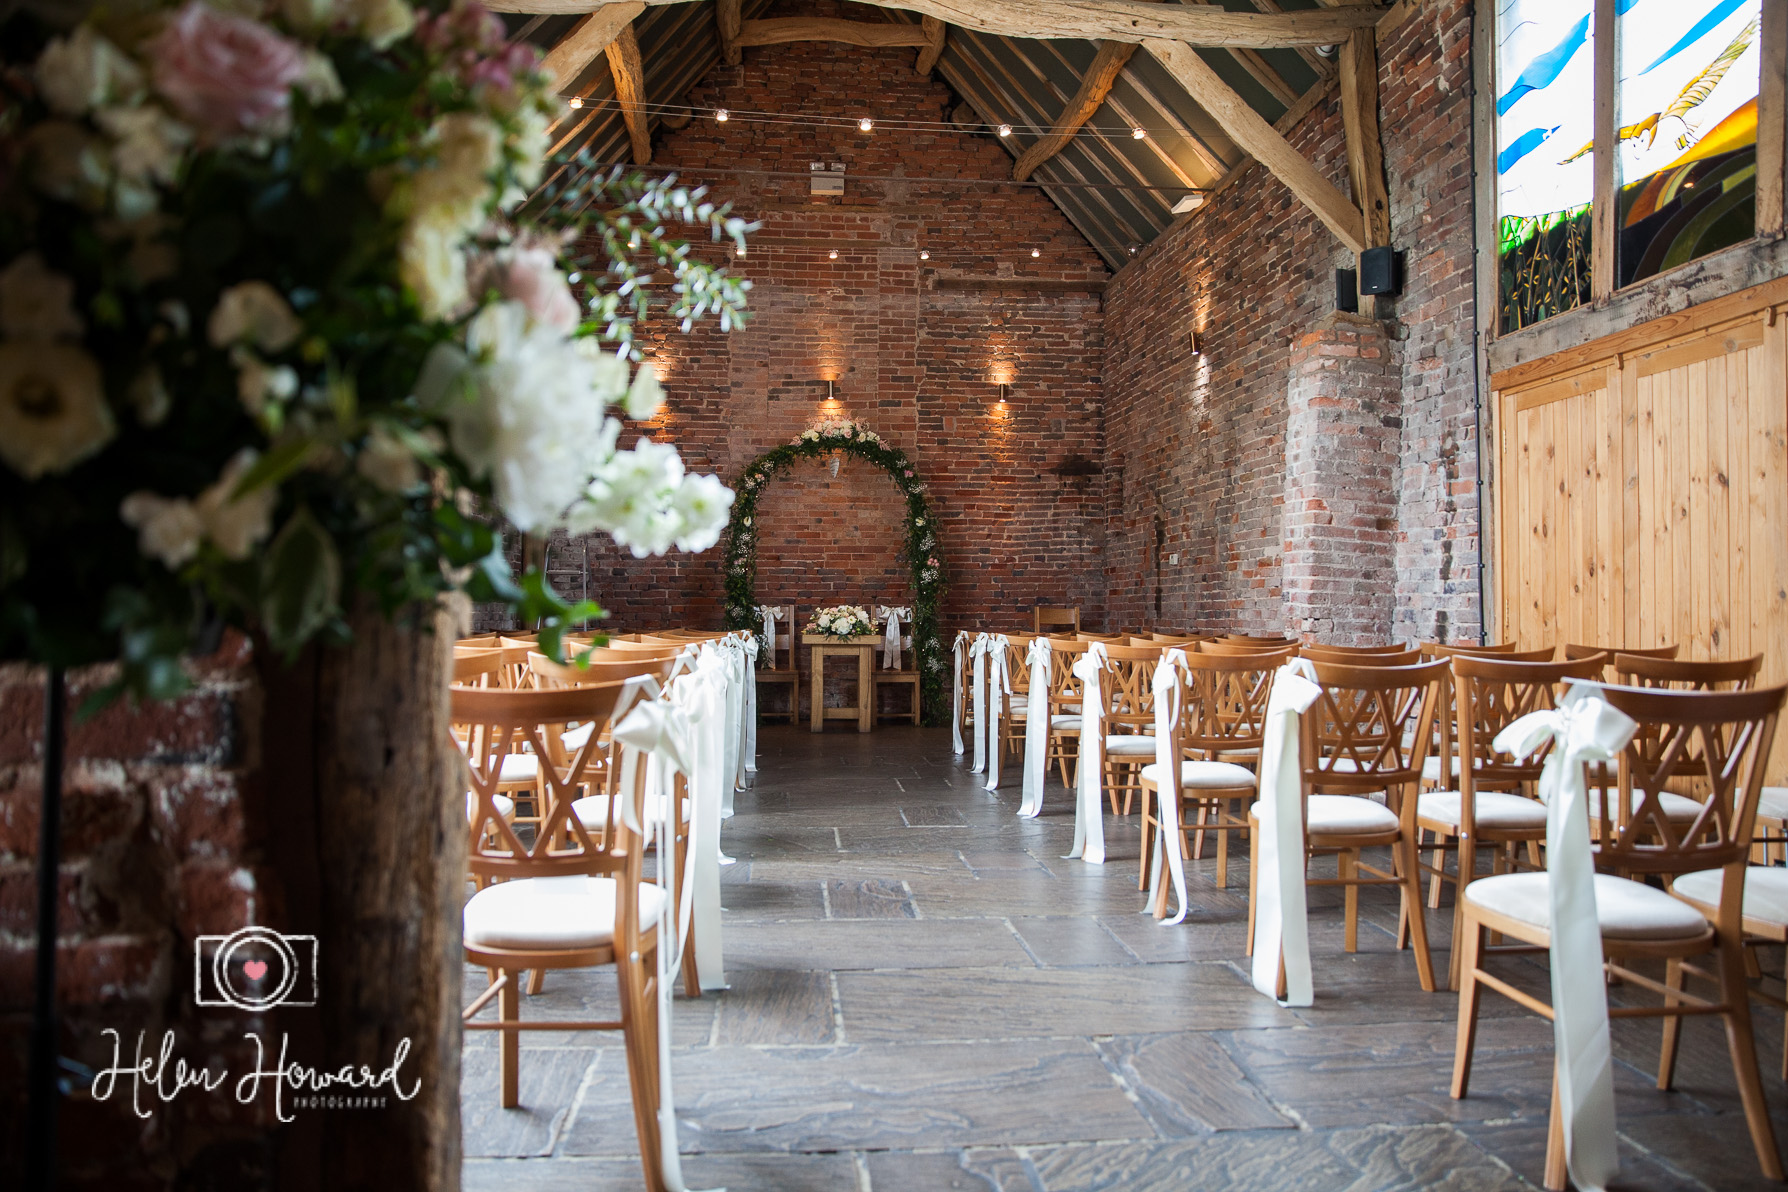 Helen Howard Photography Packington Moor Wedding-21.jpg